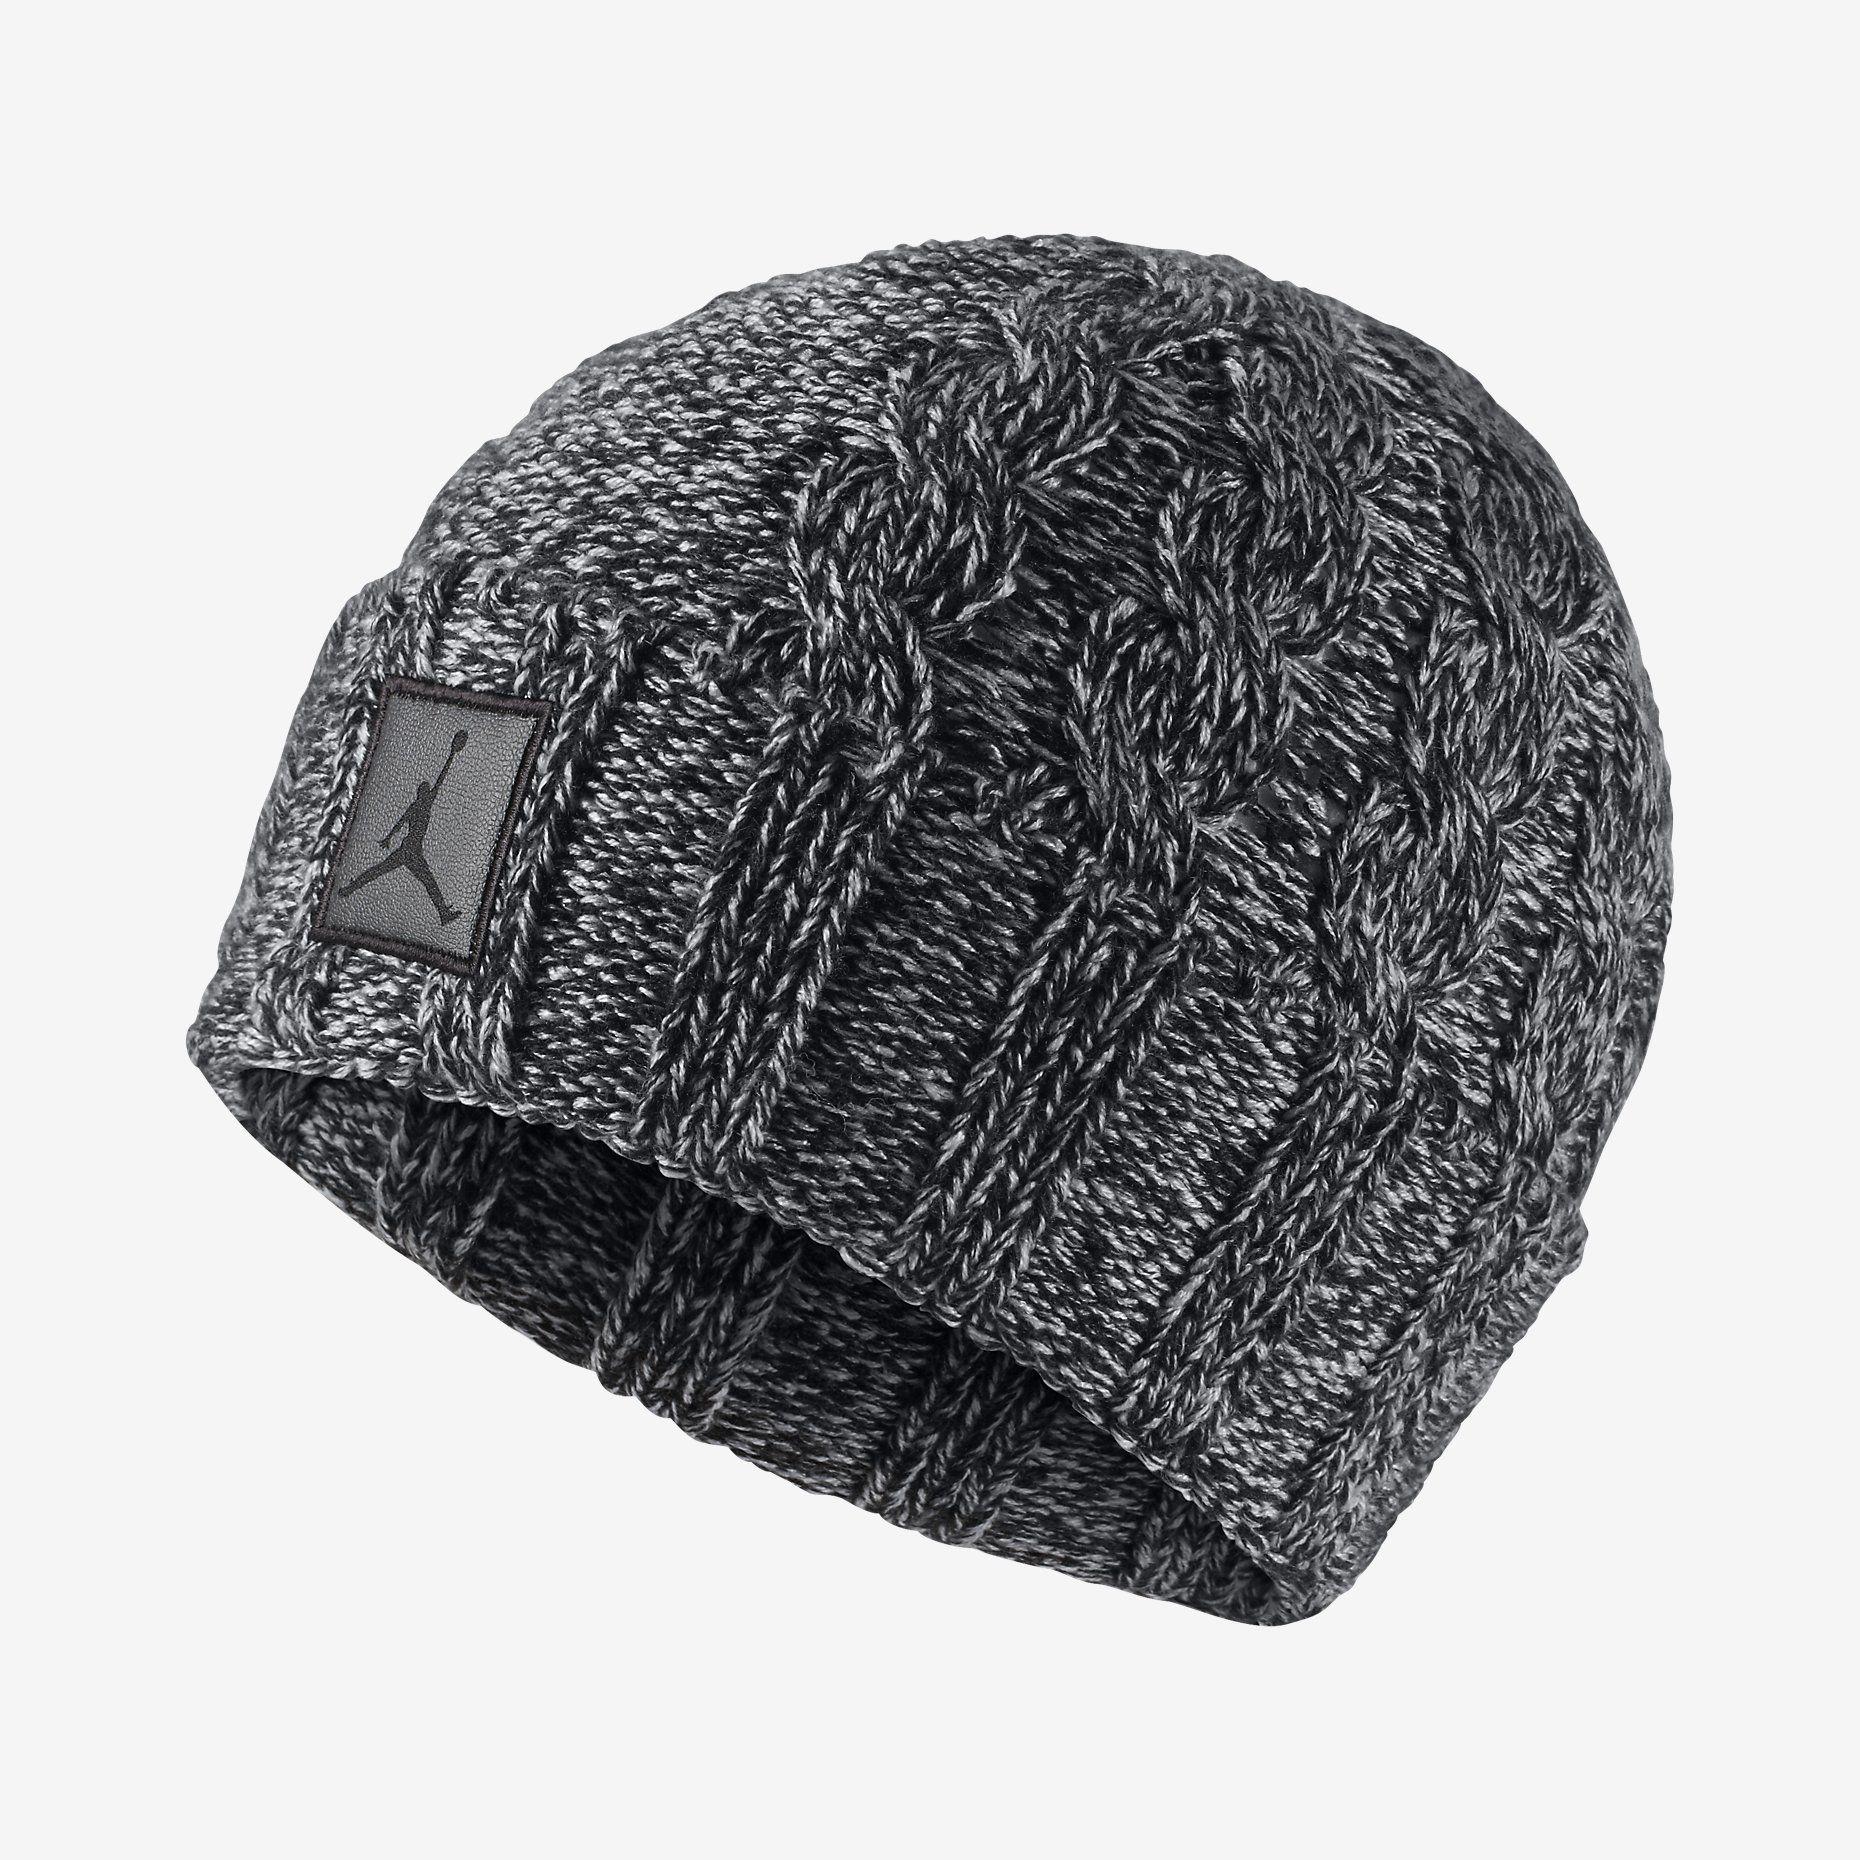 ... switzerland jordan heathered cable knit hat. nike store uk 67471 5d719  ... 862affa1f236